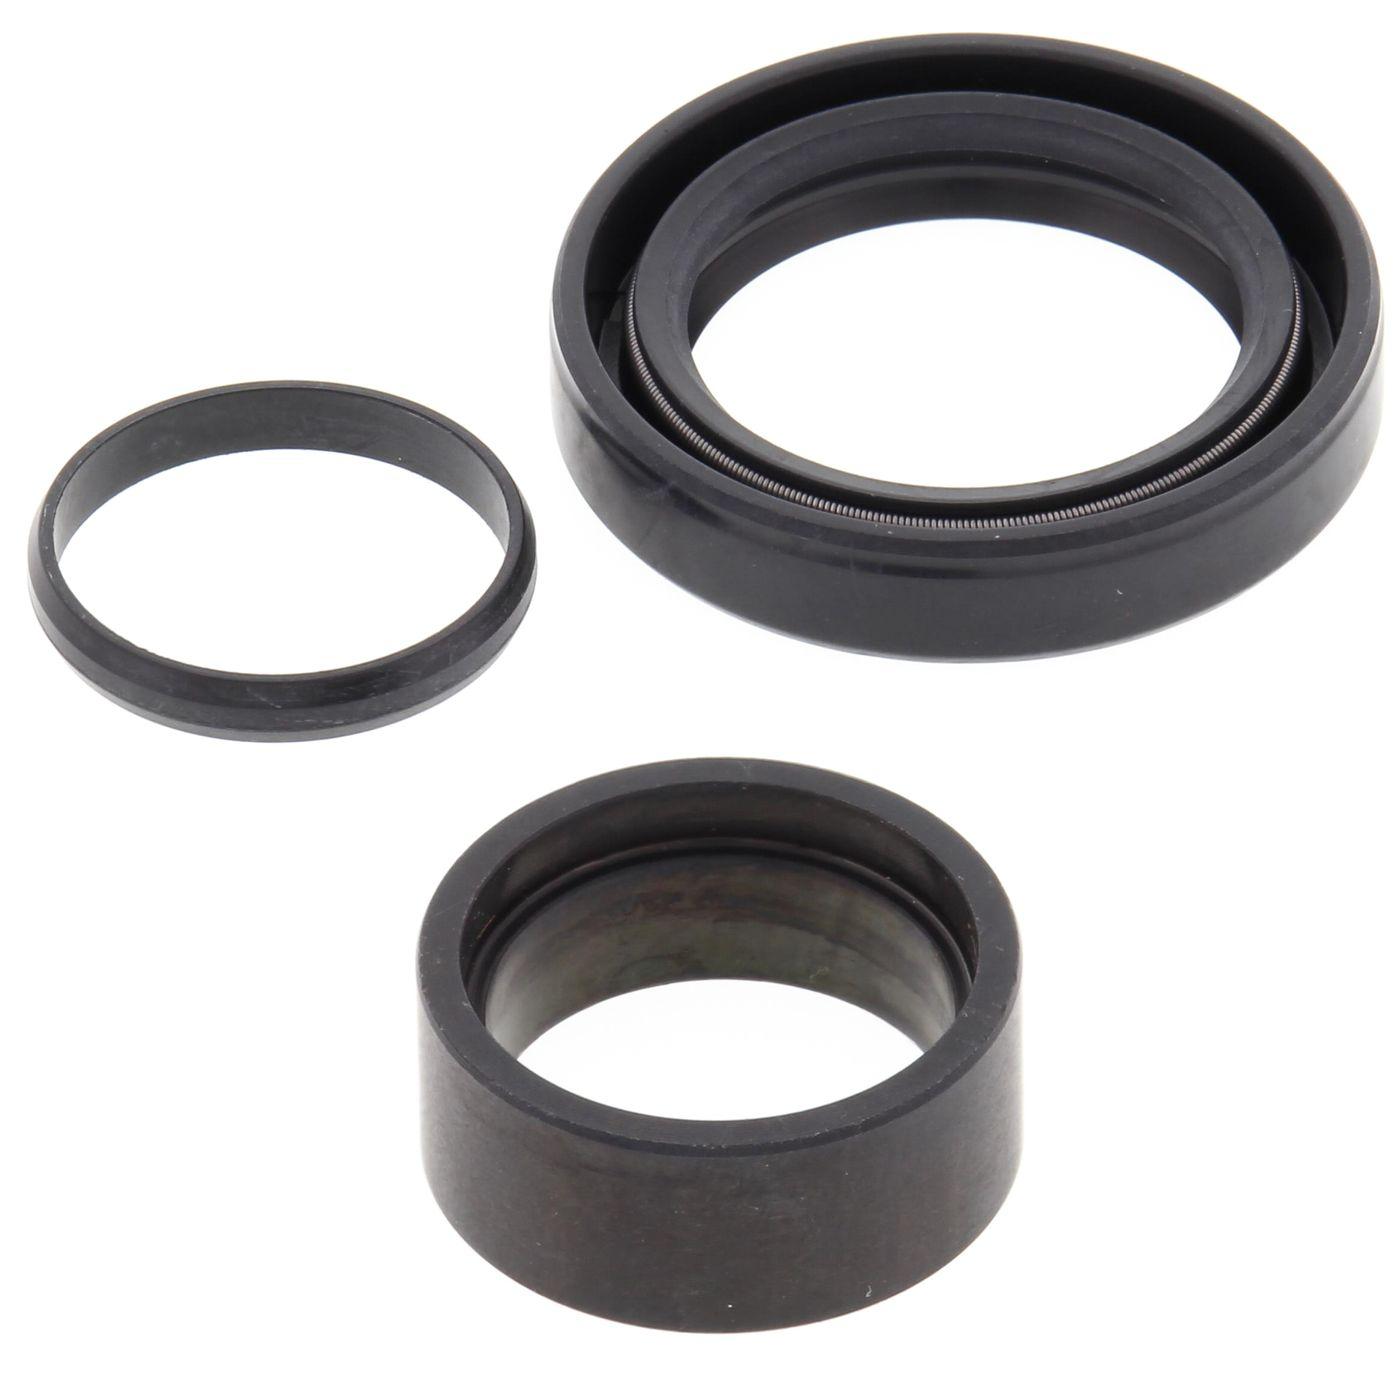 Wrp Drive Shaft Seal Kits - WRP254010 image